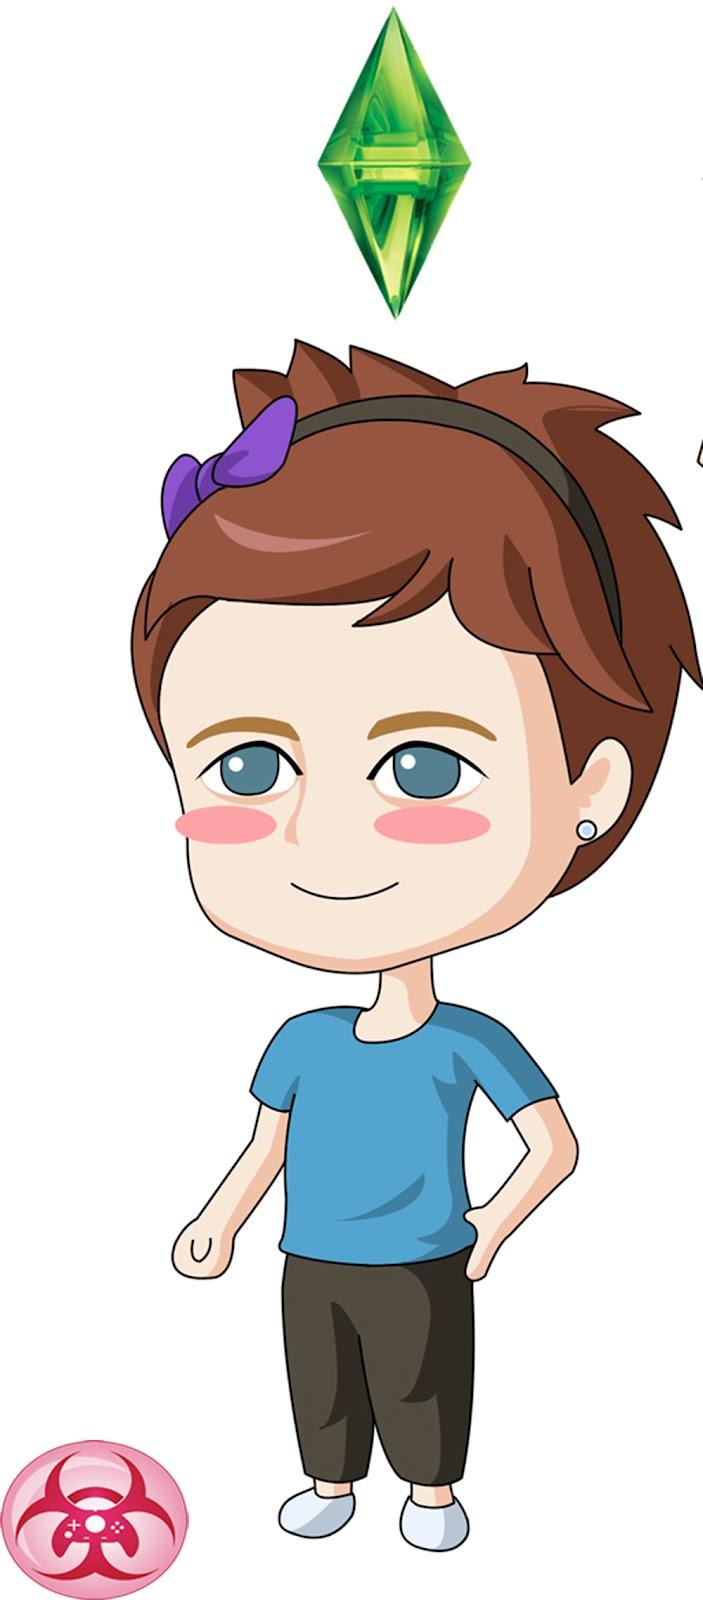 Staff BioGamer Girl – Associate Editor Job Description